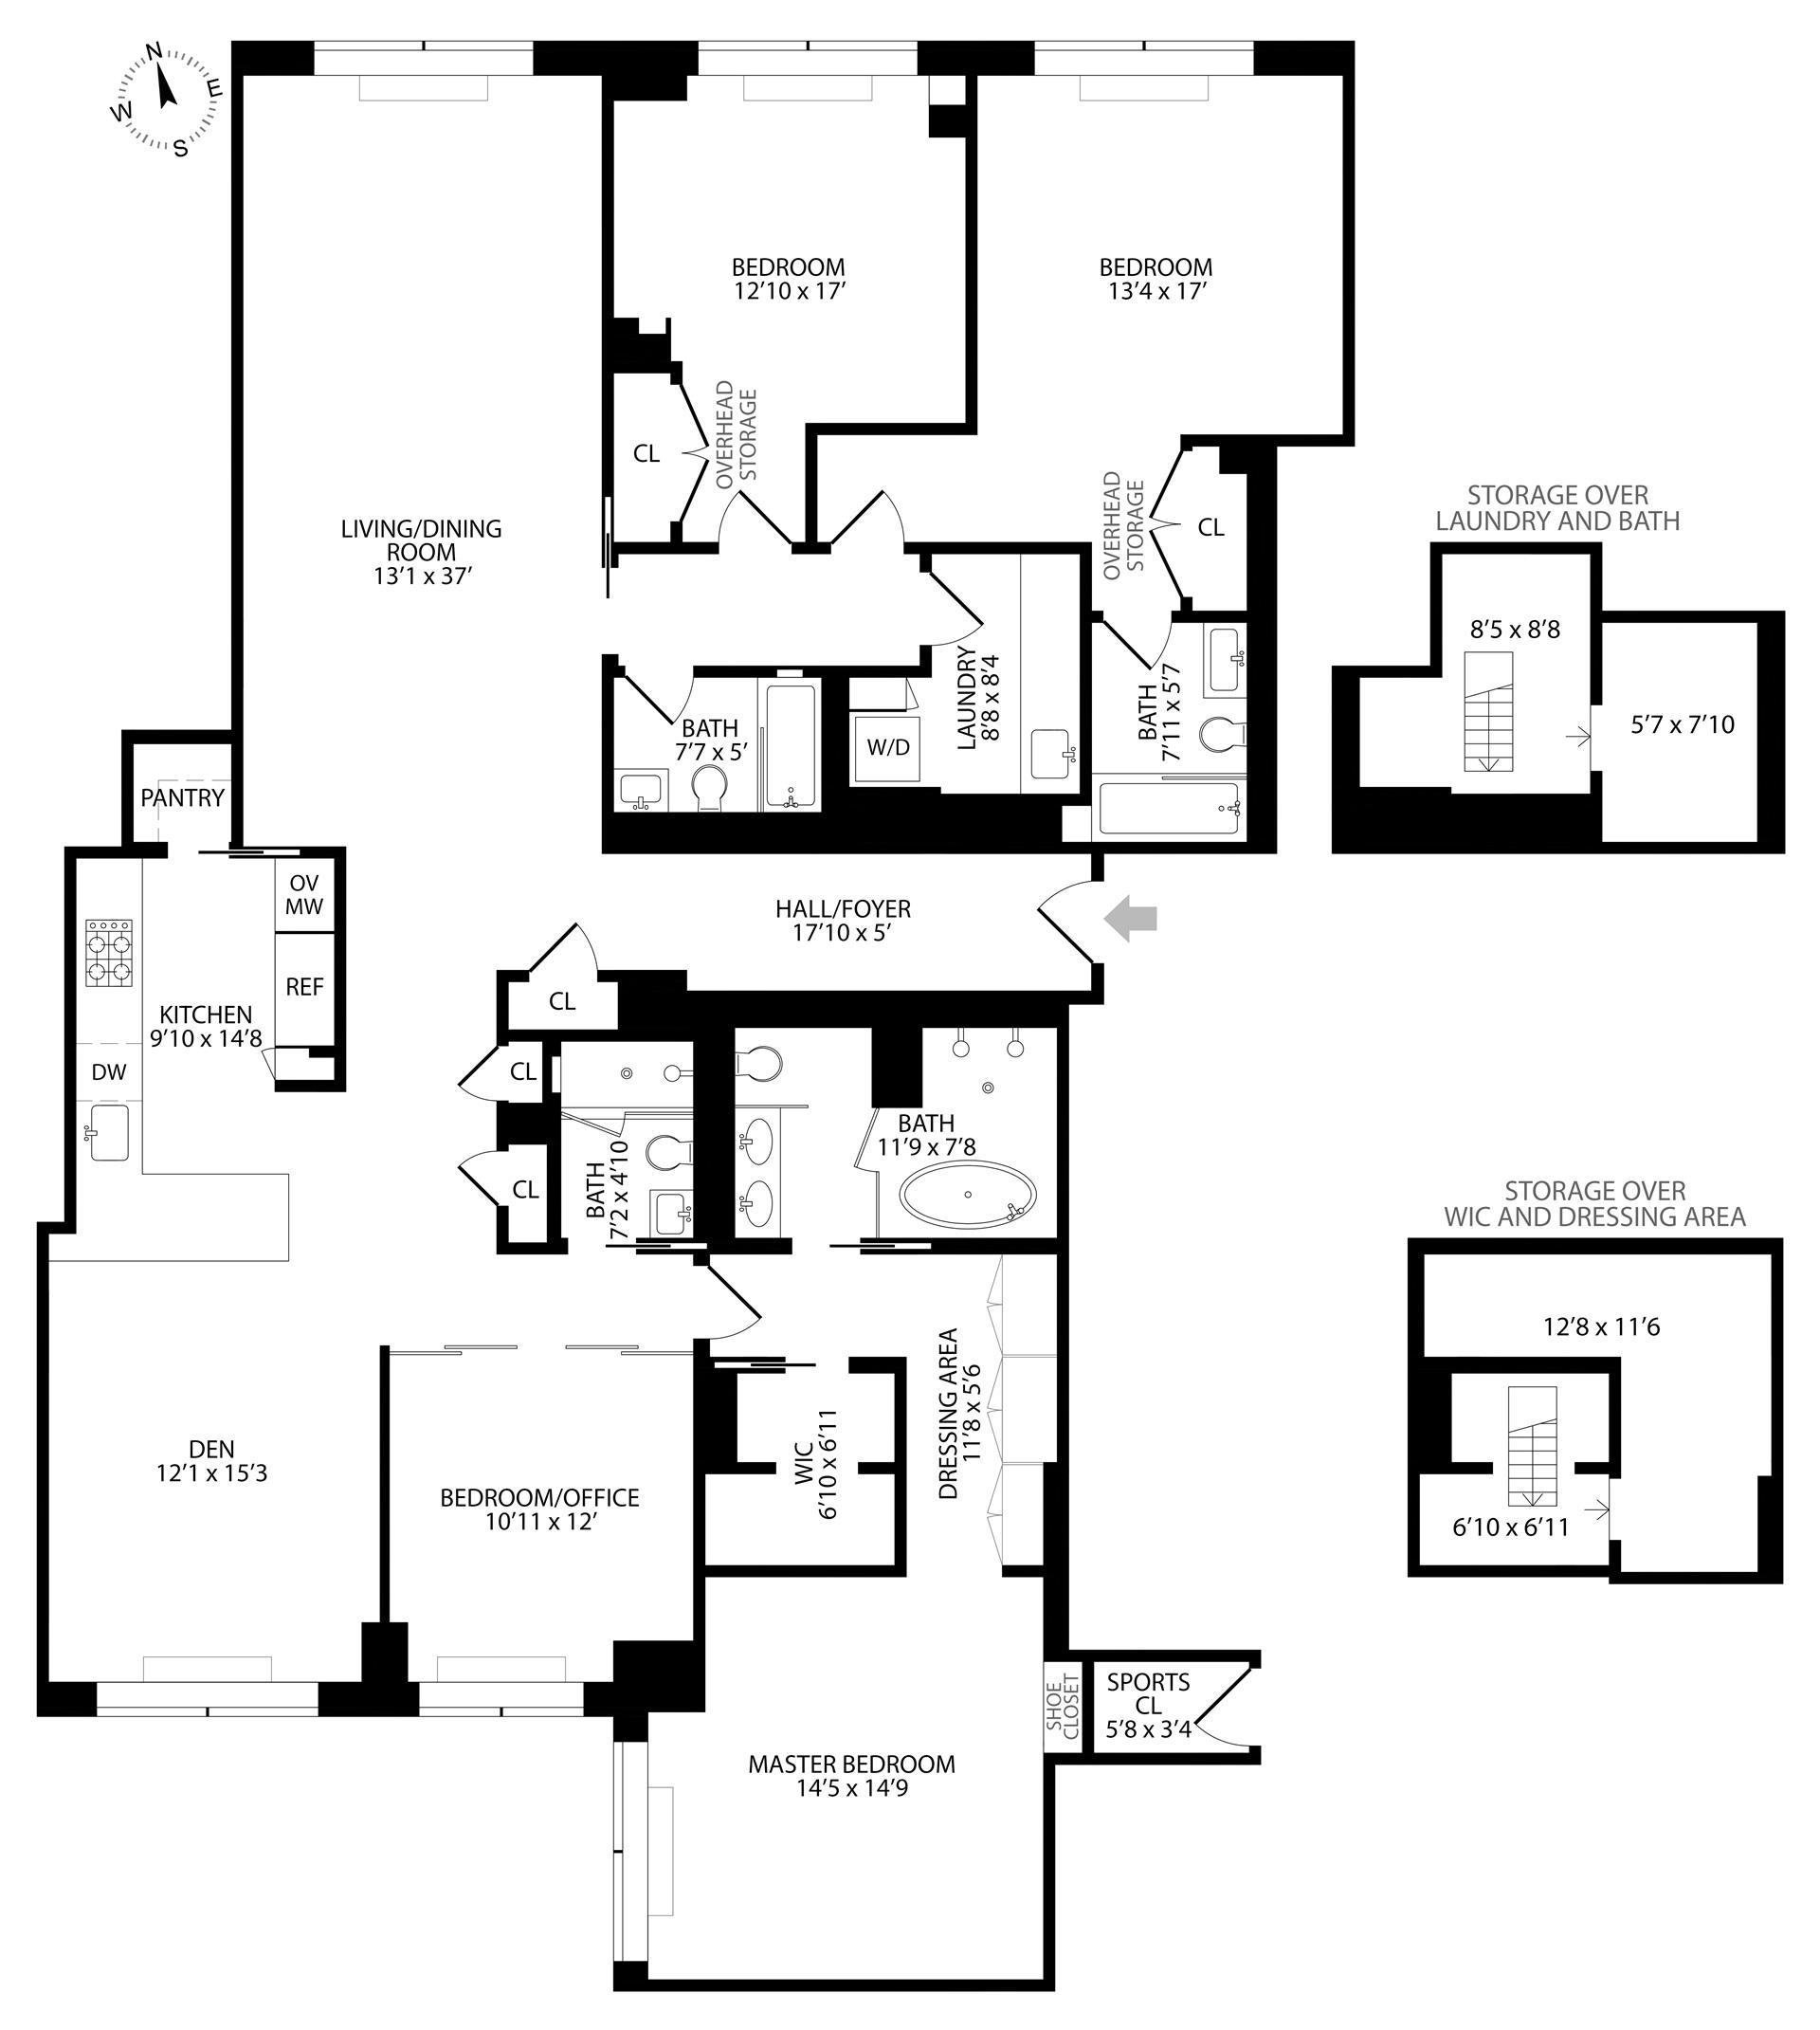 Floor plan of 120 East 87th St, R12LK - Carnegie Hill, New York